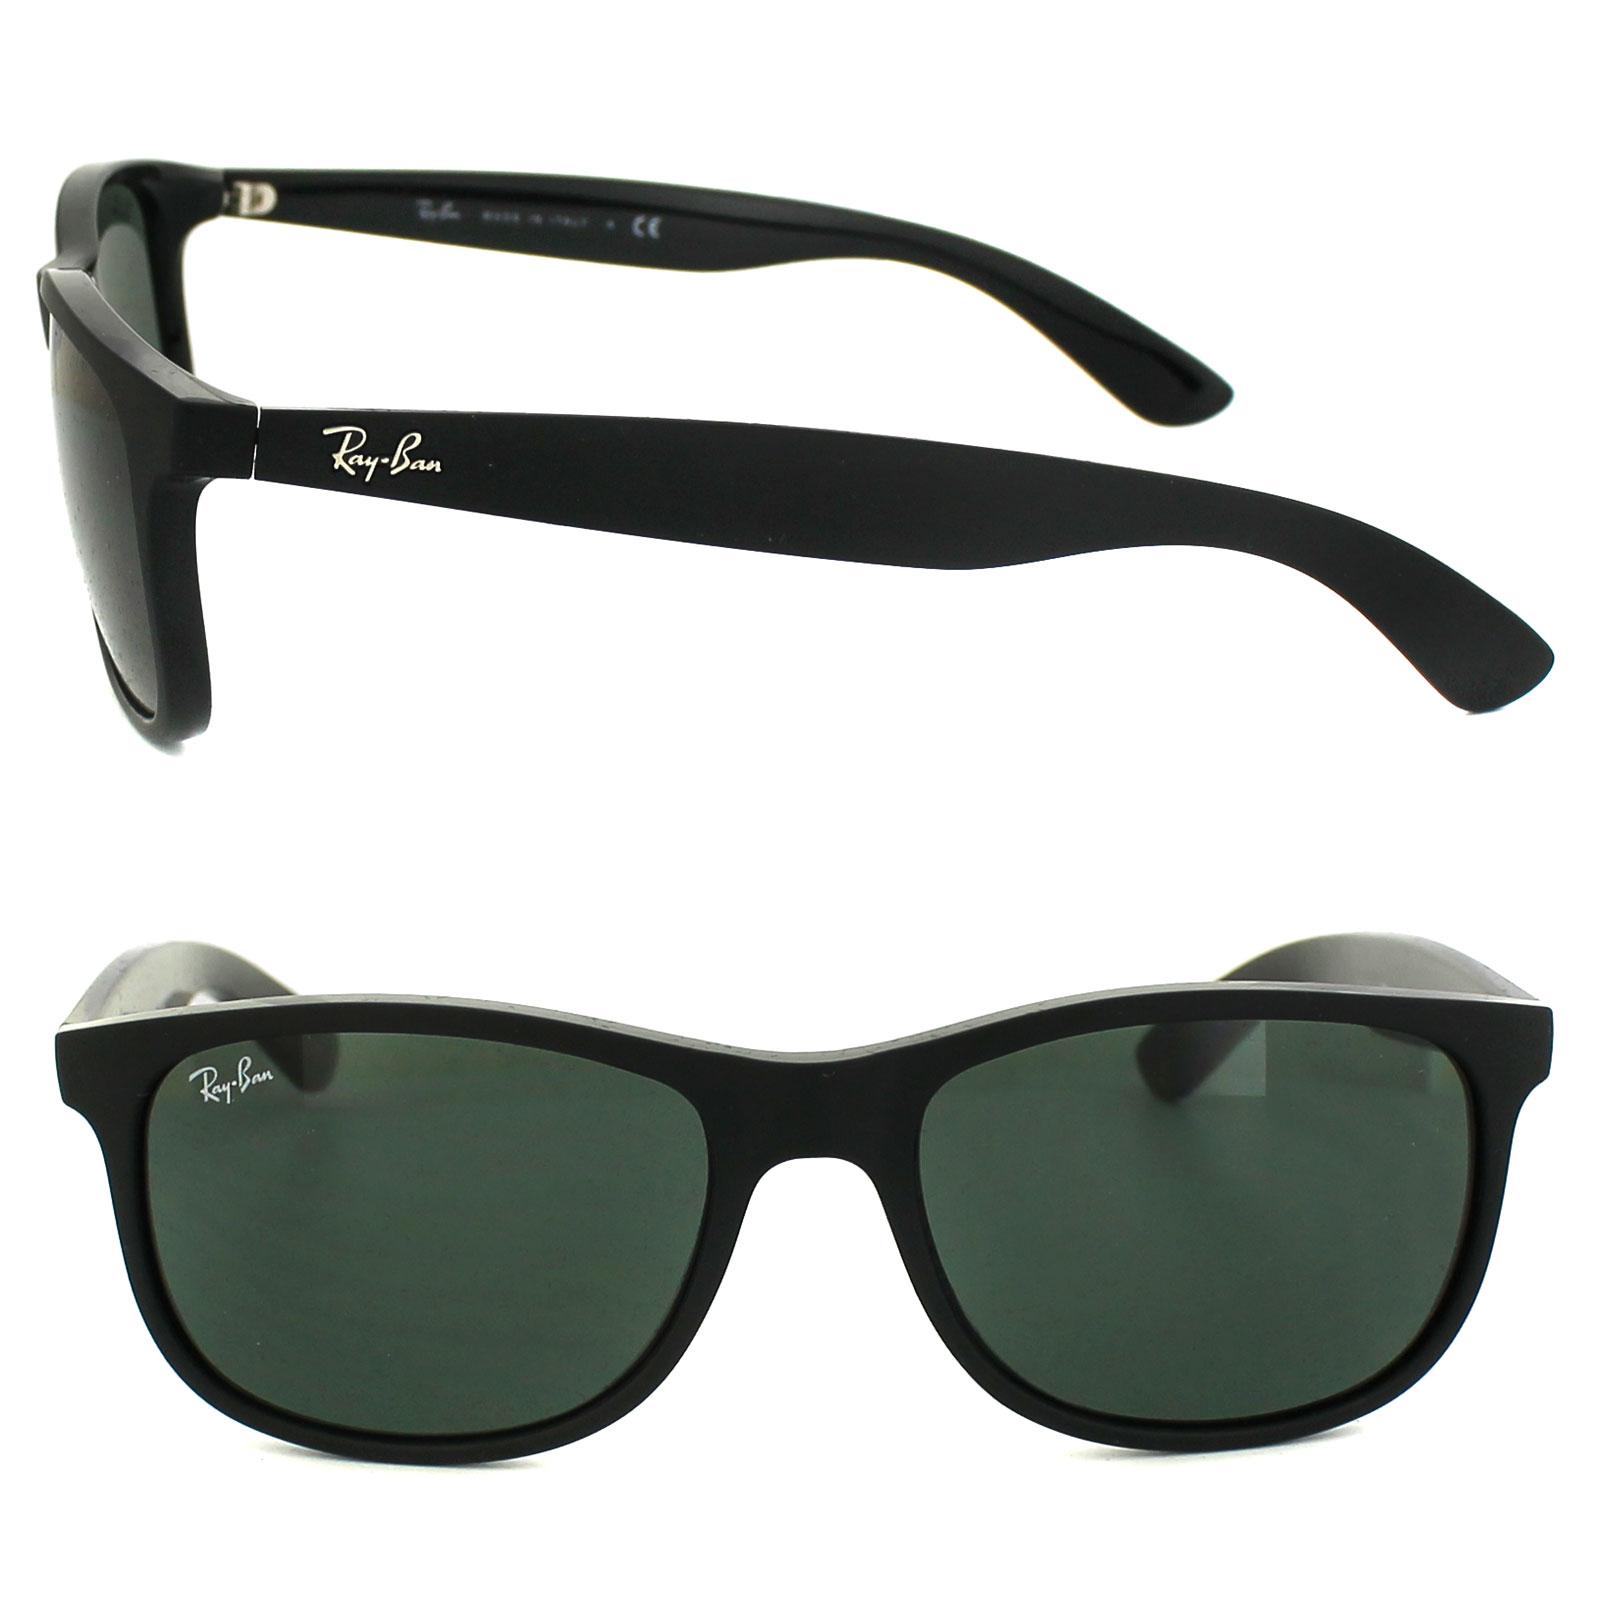 28afc9328b599 Ray-Ban Sunglasses Andy 4202 606971 Matt Black Green 8053672188868 ...